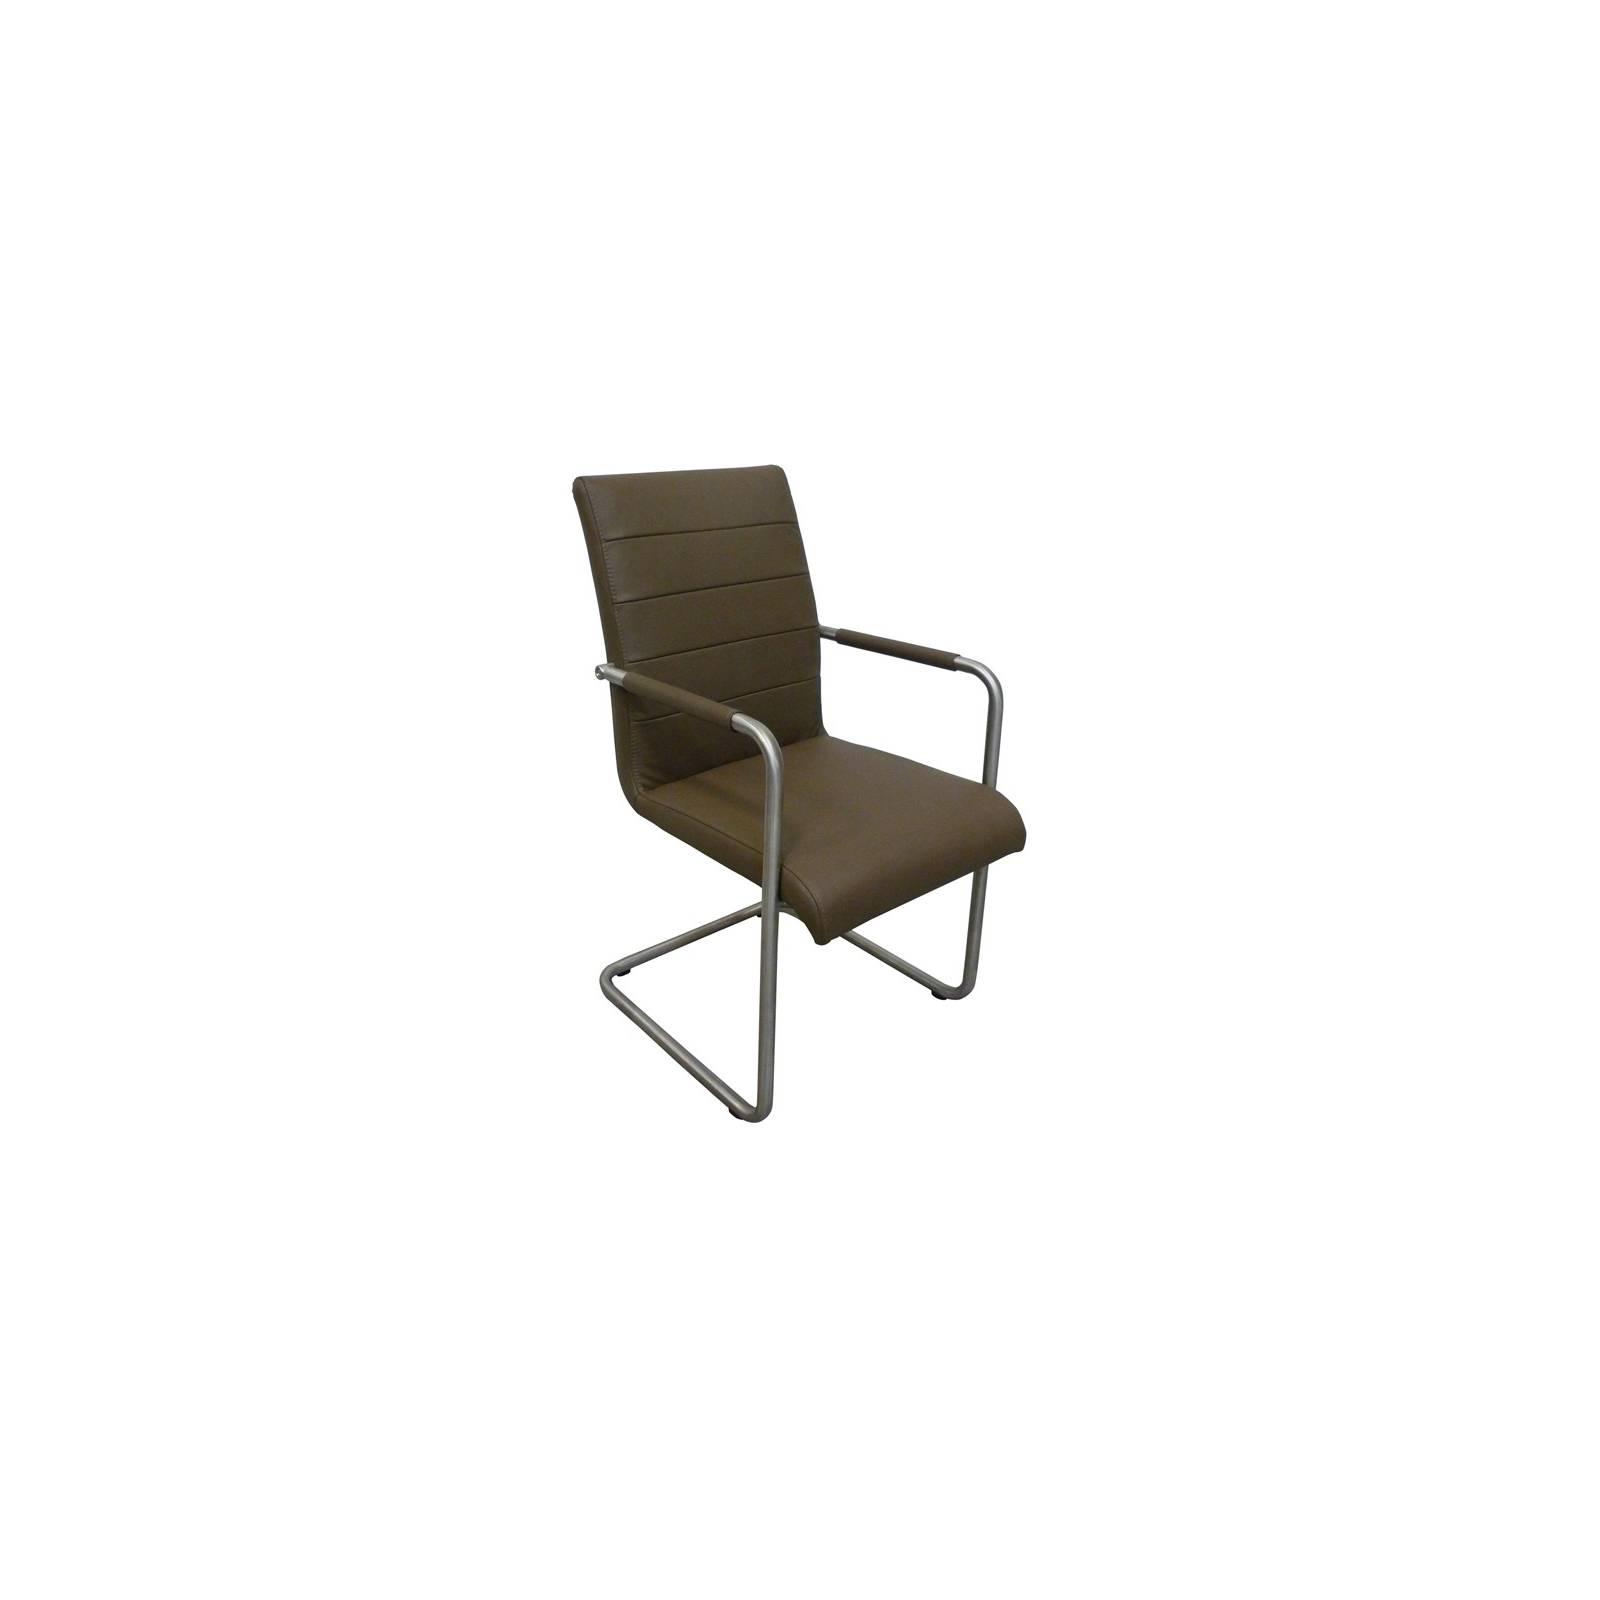 Chaise Accoudoirs Lizzy Cuir - chaise design